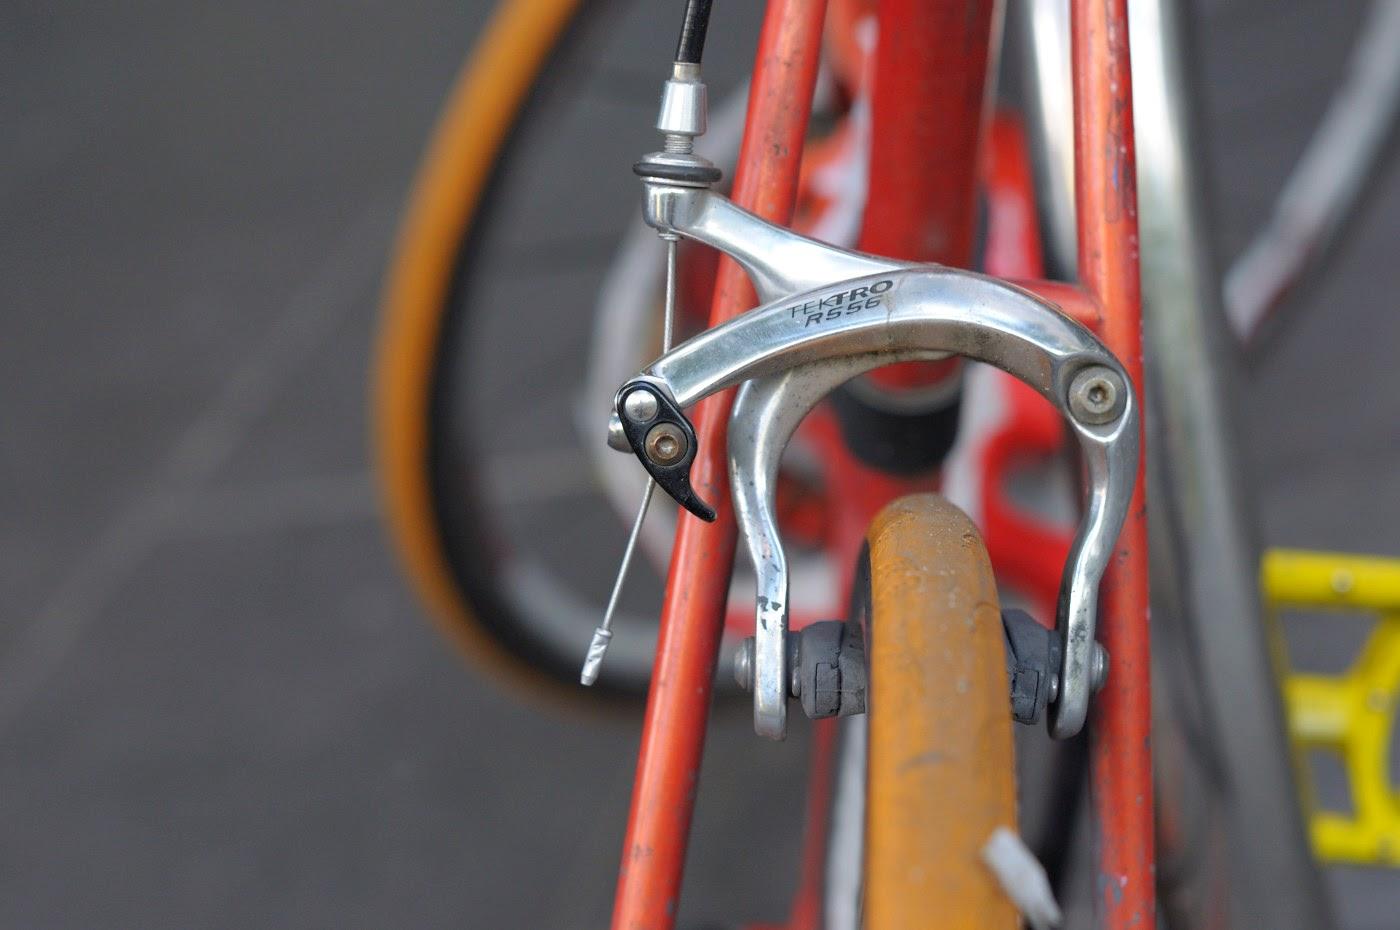 bespoke, custom, single speed, conversion, road bike, swanston st, Melbourne, Australia, decals, stickers, red, selle, miche,